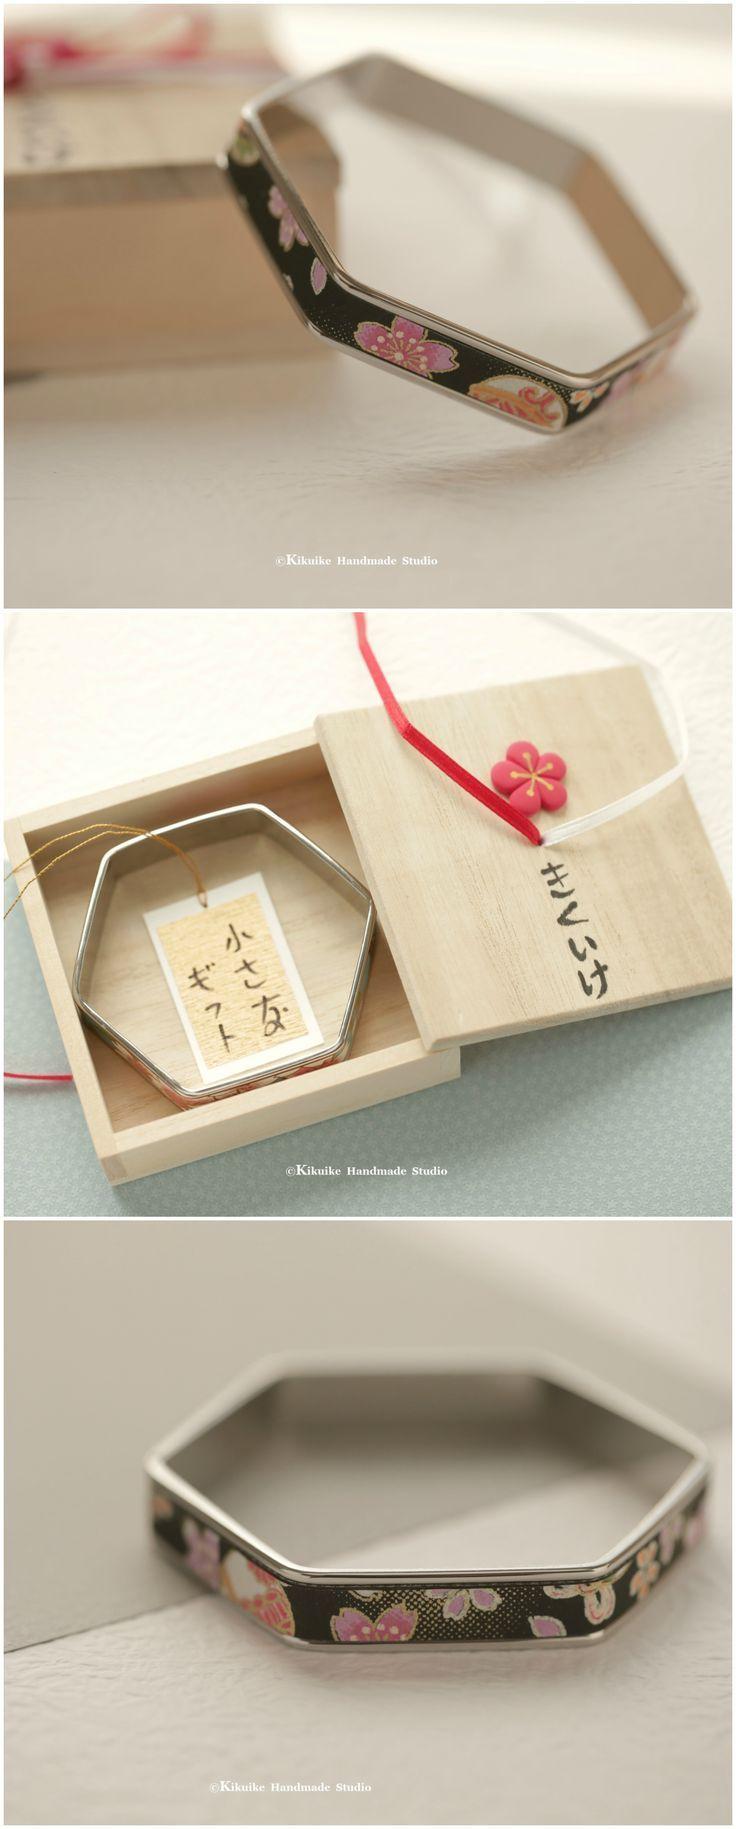 Handmade Japanese chiyogami Bracelet,hand wrapped chiyogami paper ...